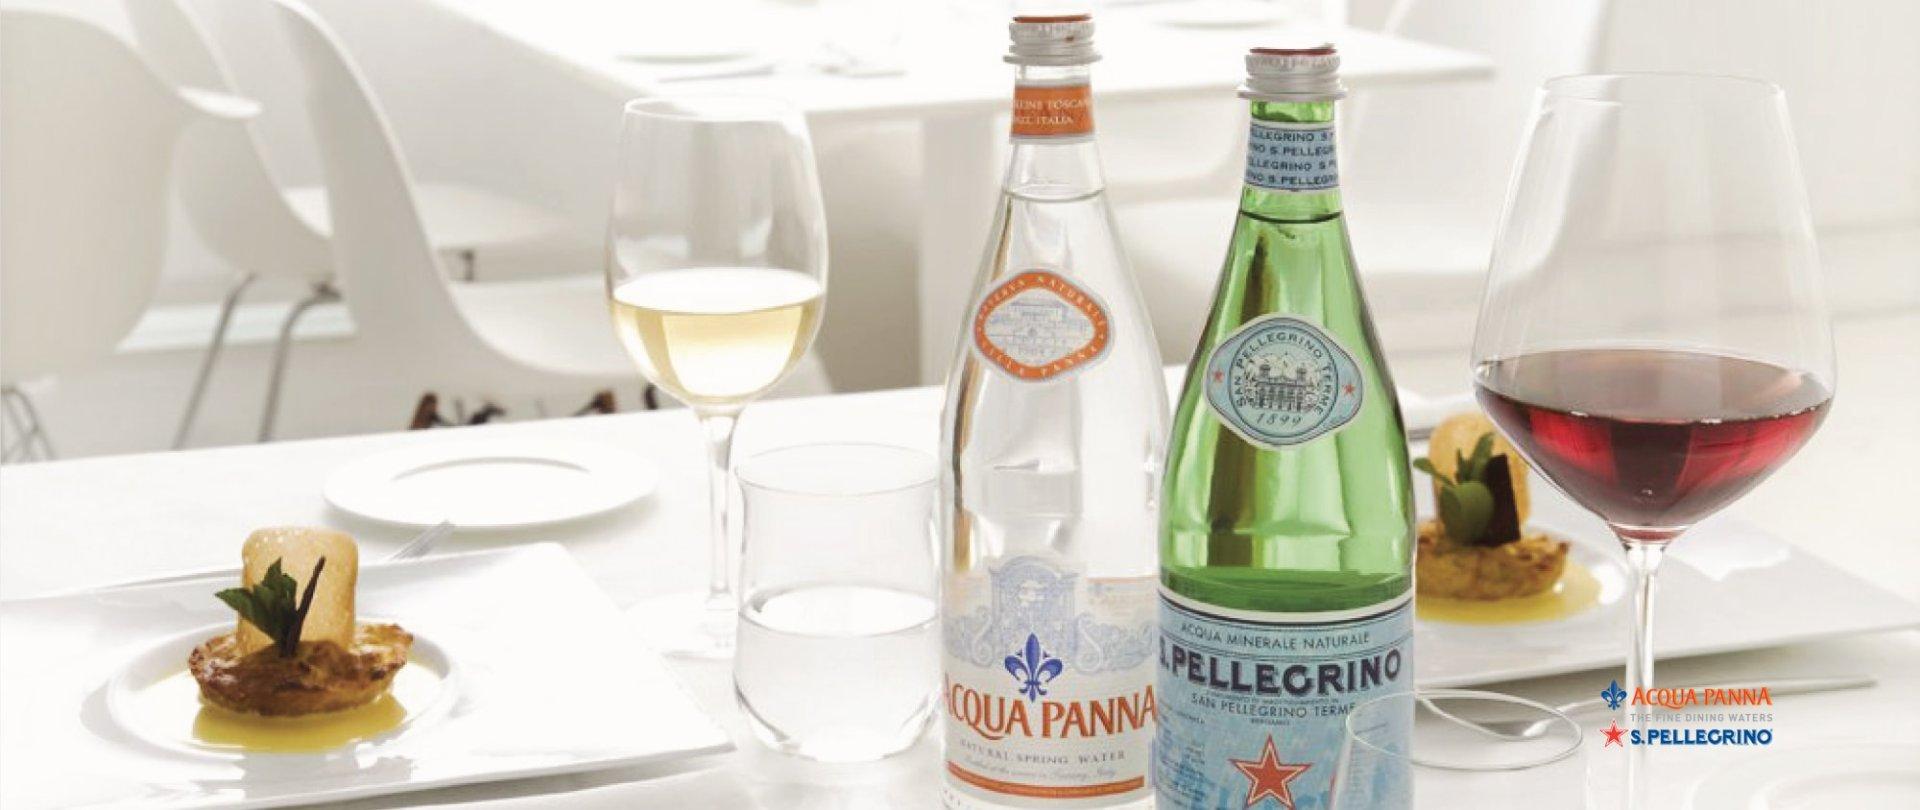 Acqua Panna & San Pellegrino6